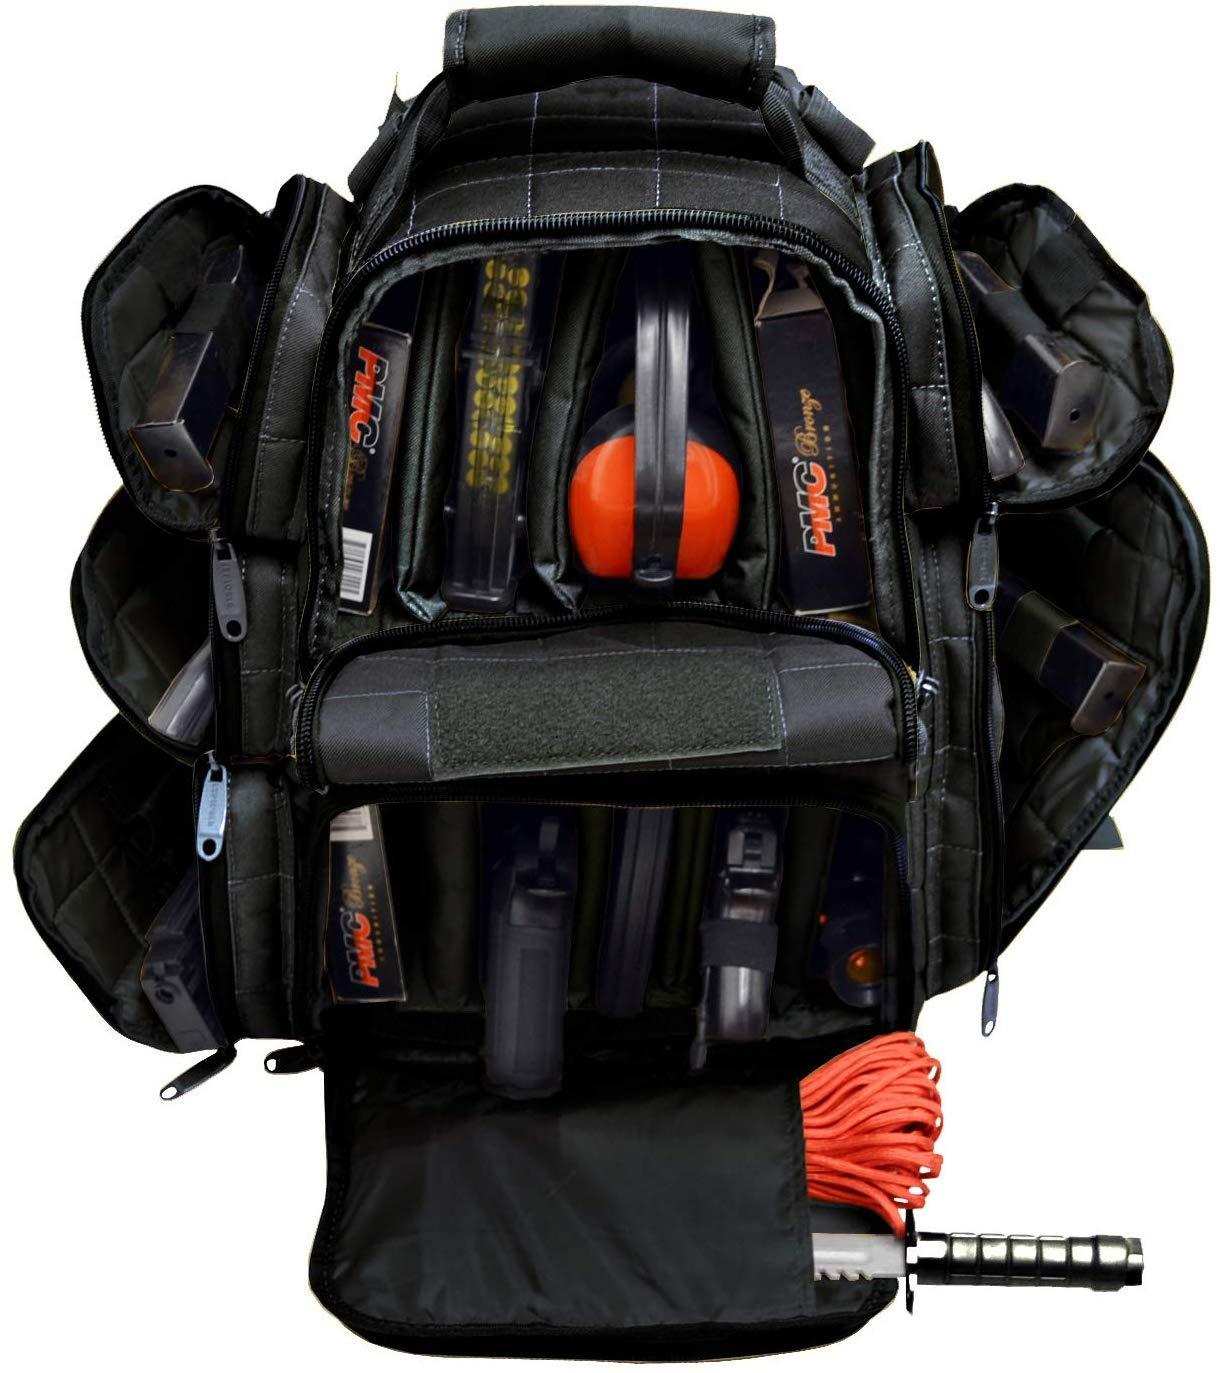 EXPLORER Backpack + Range Bag with Large Padded Deluxe Tactical Divider and 9 Clip Mag Holder - Rangemaster Gear Bag (black),20'' x 12.5'' x 10'' by Explorer